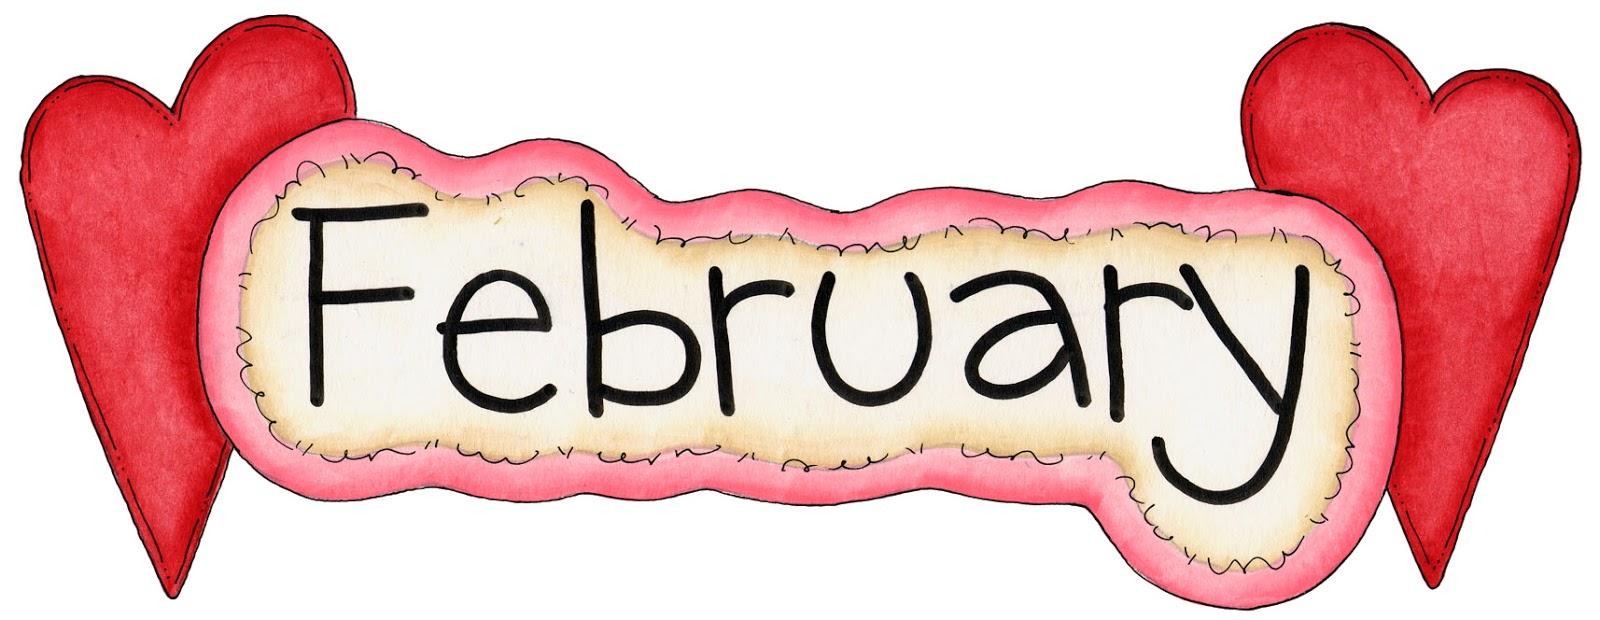 1600x620 February Calendar Clip Art